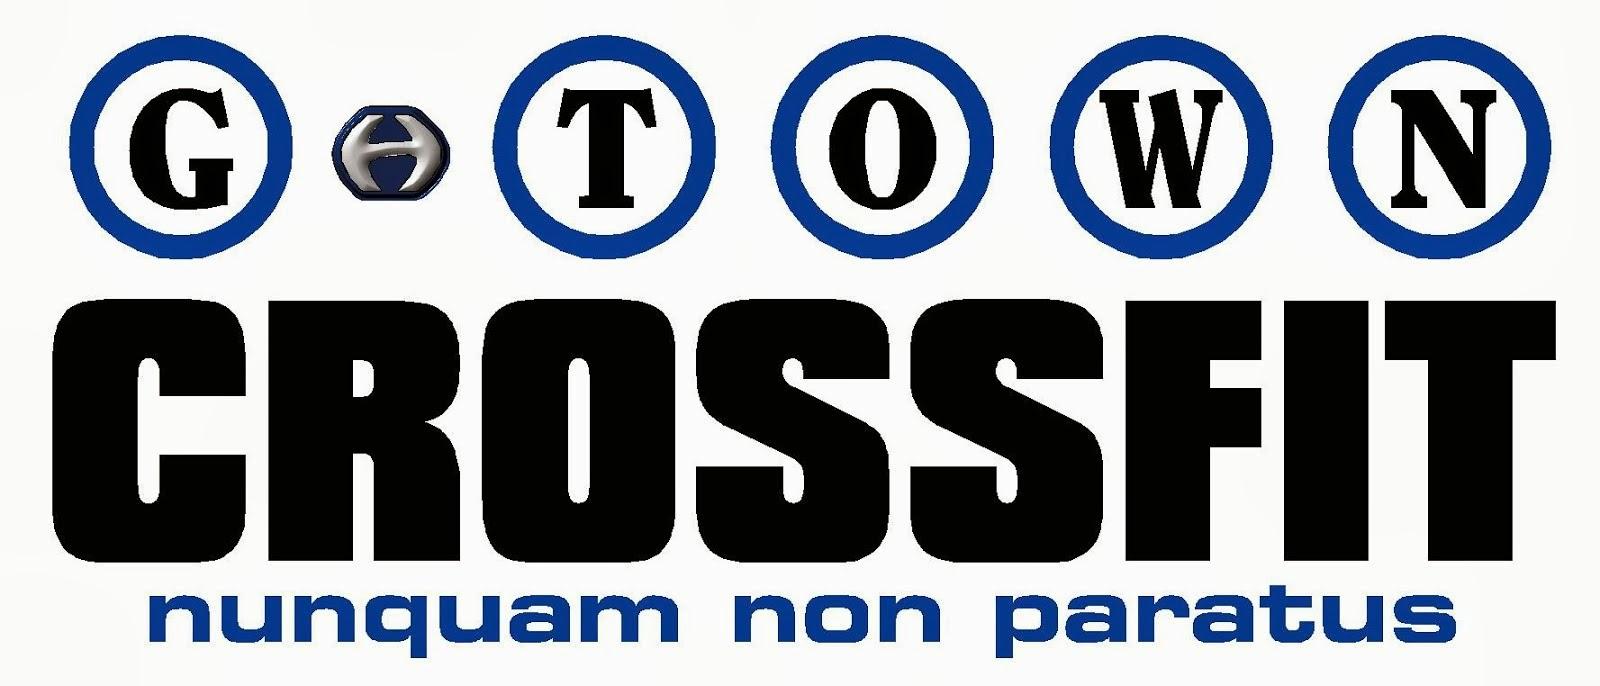 G-Town CrossFit